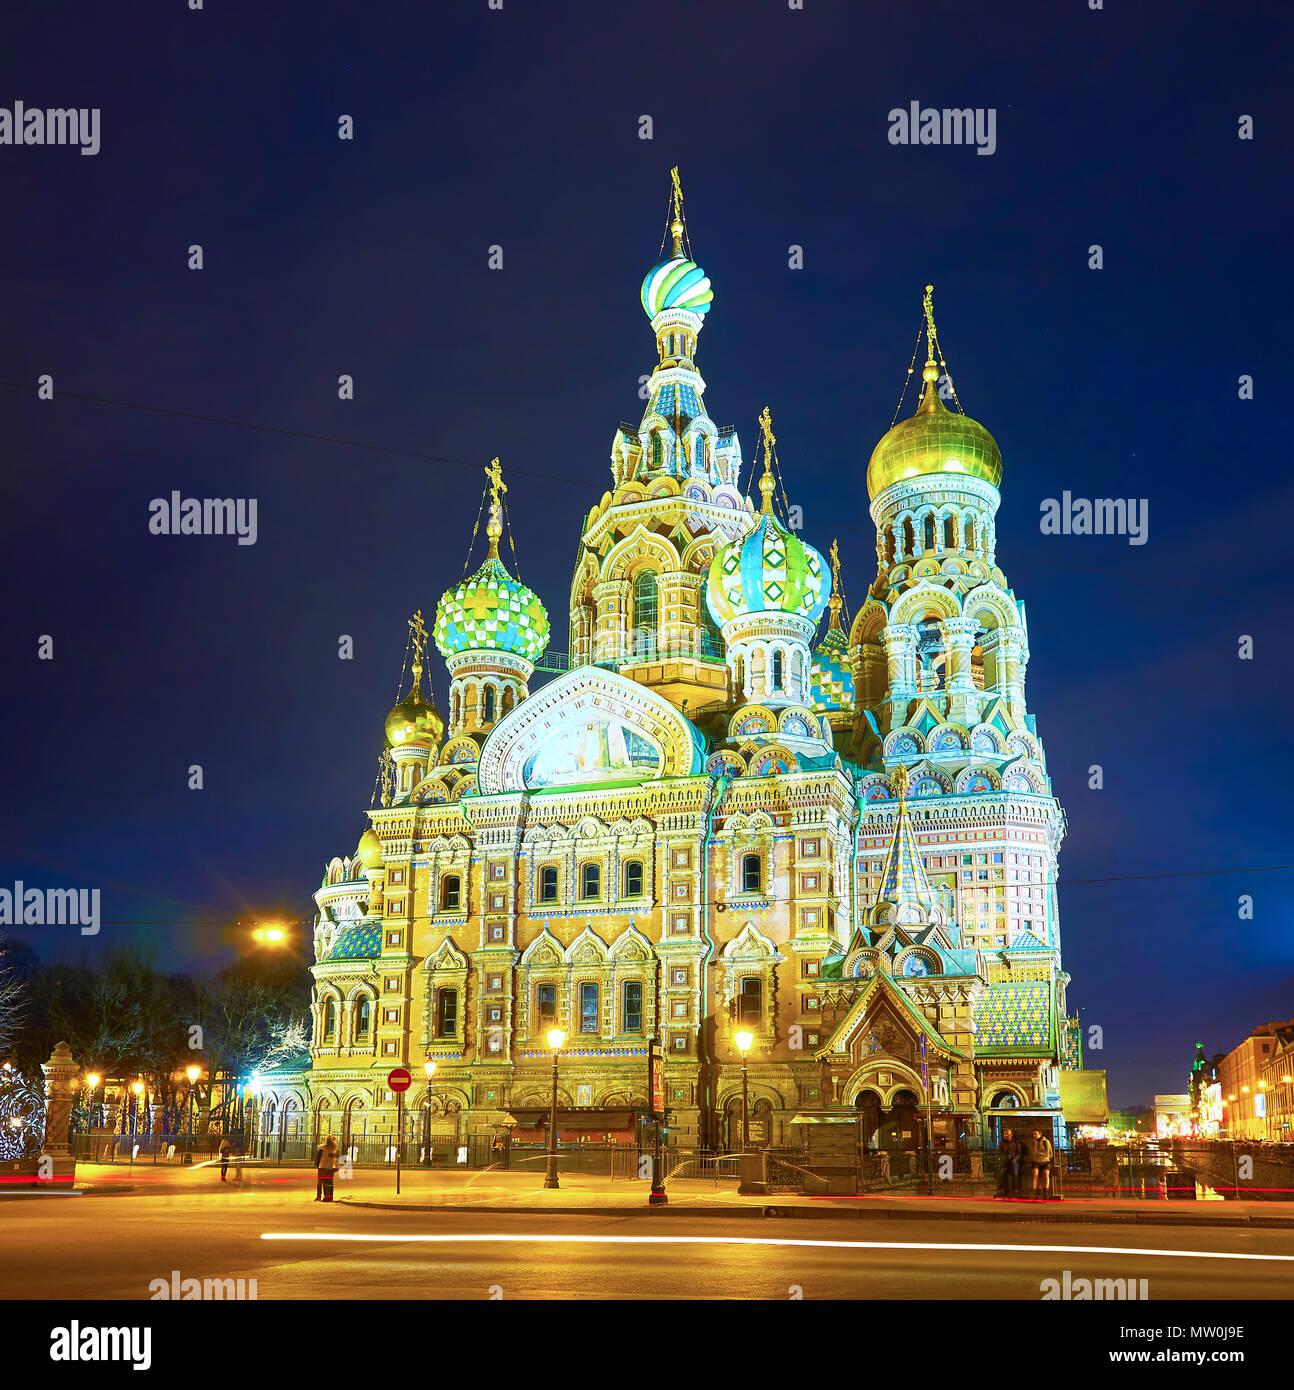 SAINT PETERSBURG, RUSSIA - APRIL 26, 2015: The beautiful Church of the Savior on Blood with beautiful city illumination, on April 26 in Saint Petersbu Stock Photo